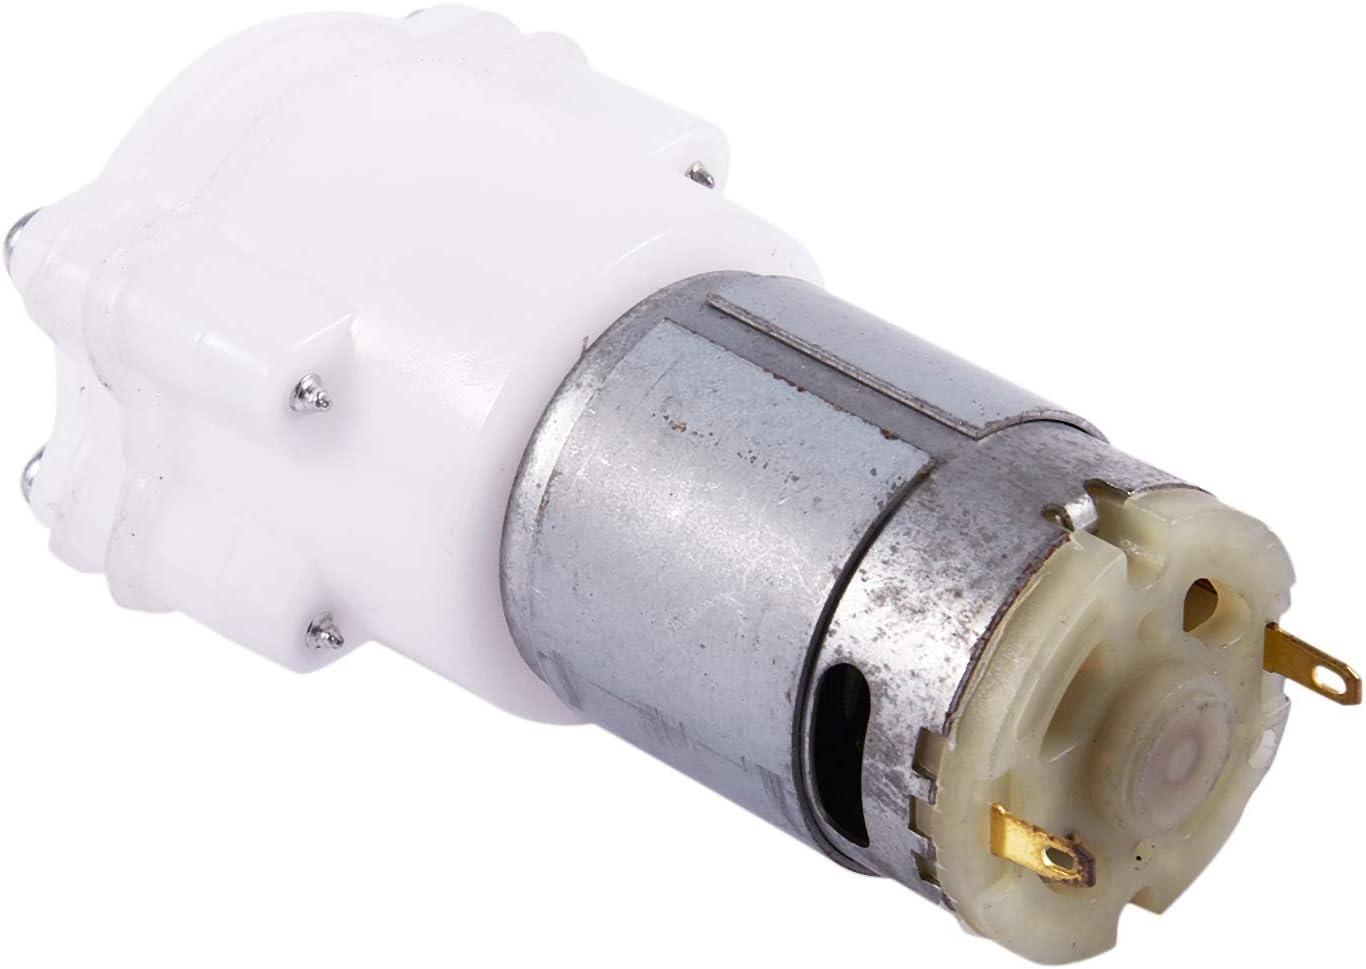 Andifany Motor de pulverizacion bomba de diafragma de cebado 12V para dispensador de agua